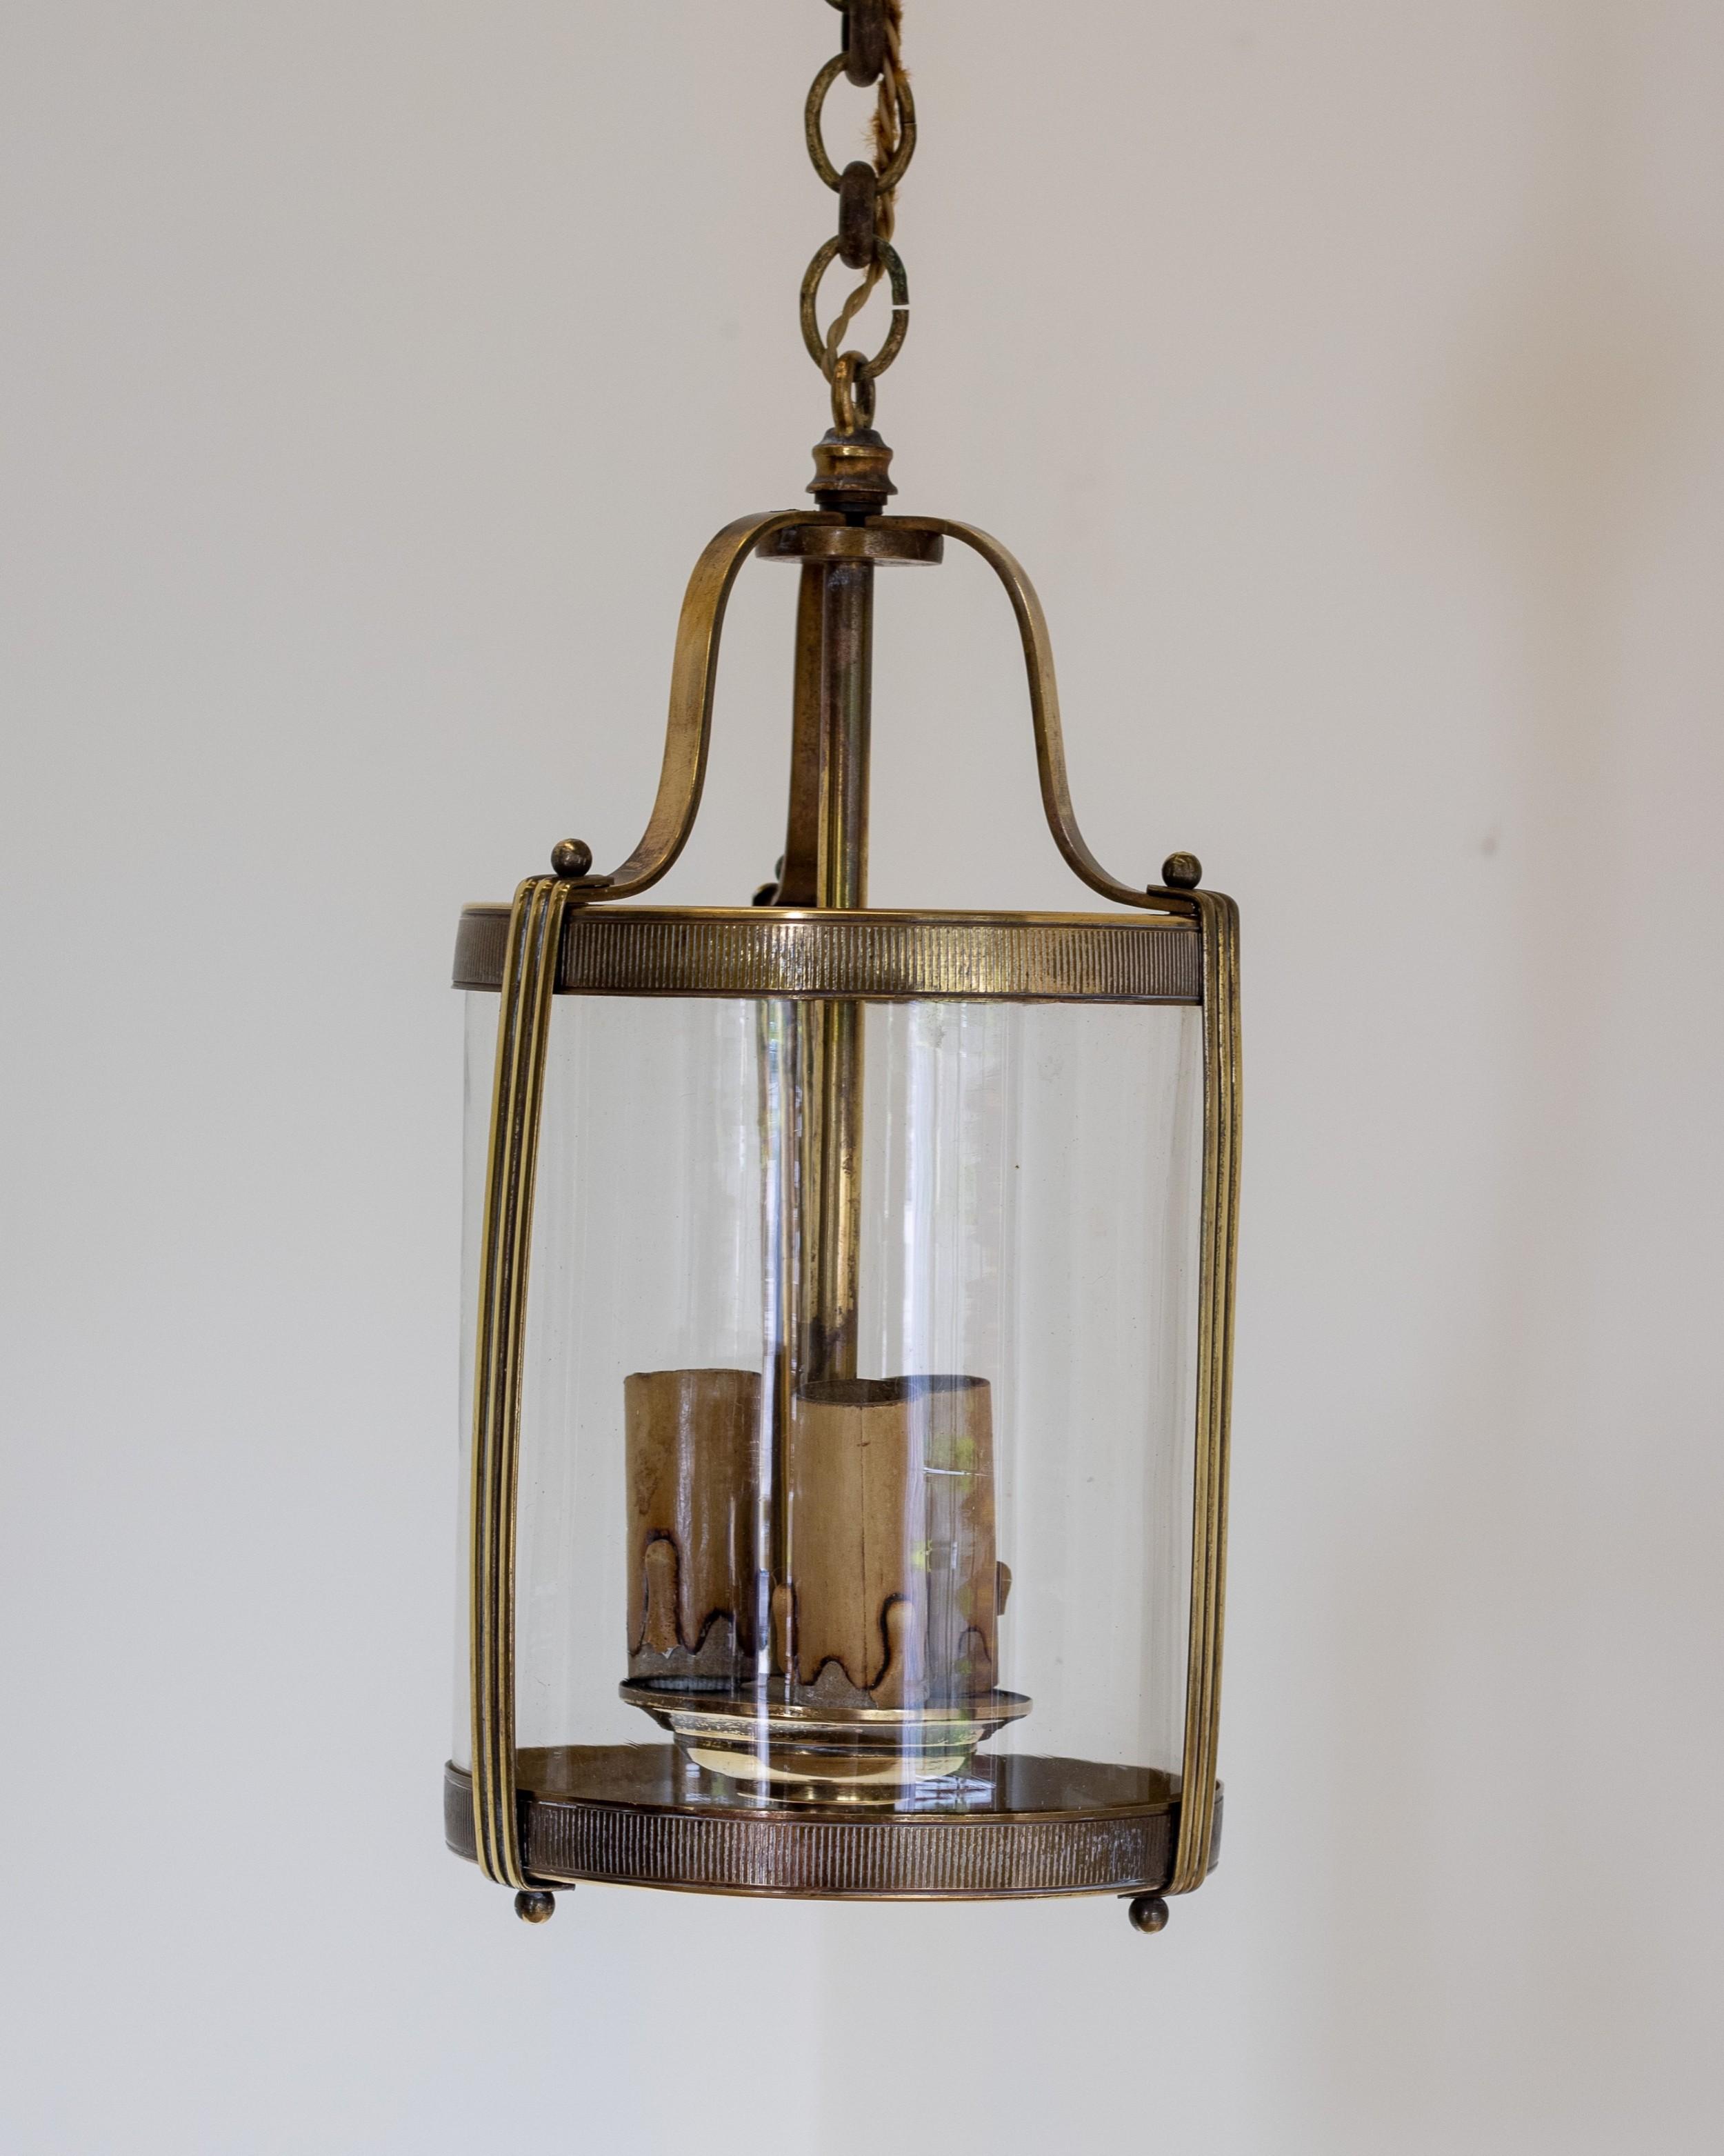 a small early 20th century brass lantern